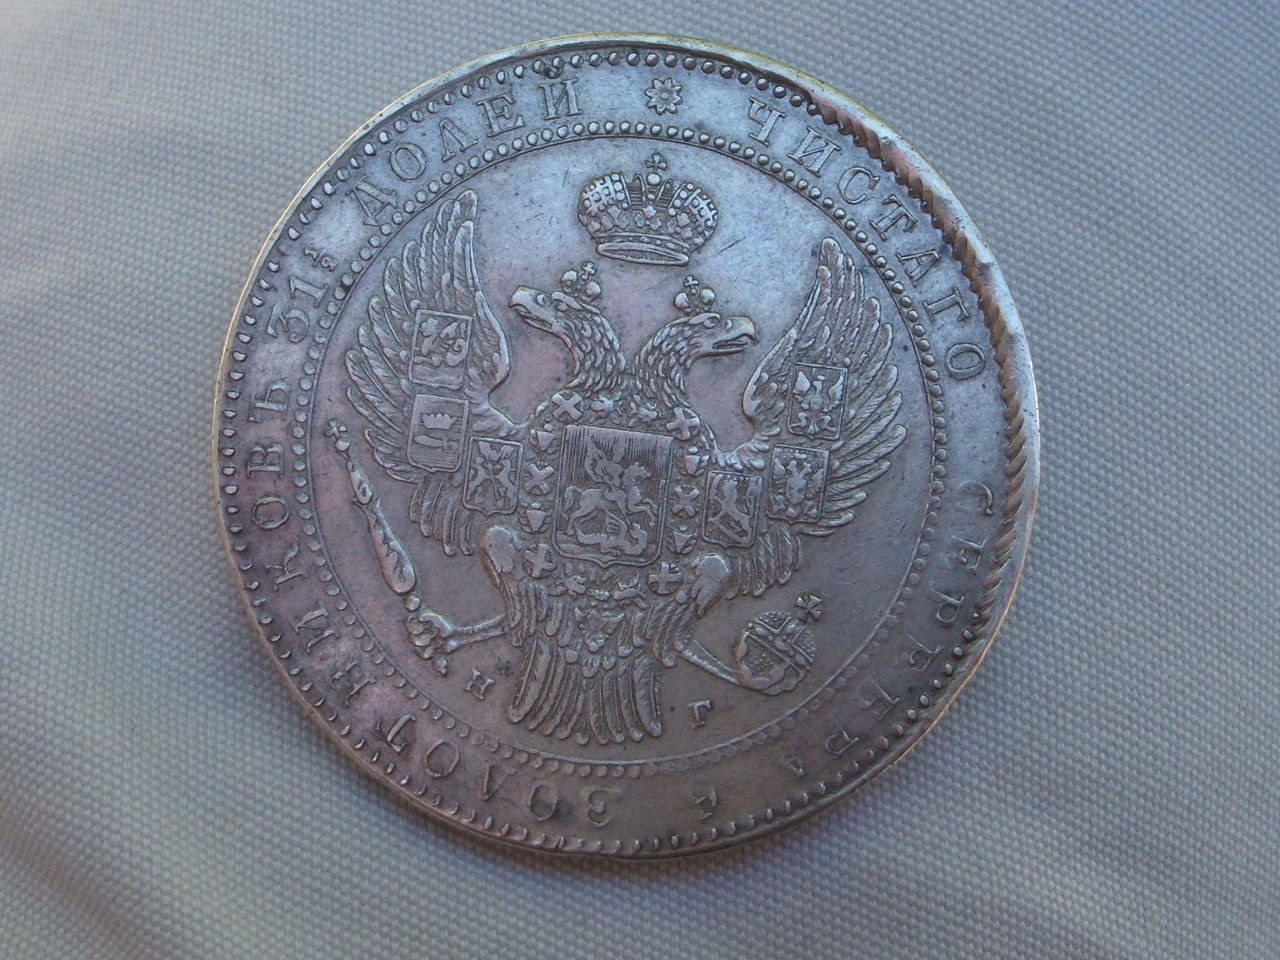 10 zloty. Polonia. 1836 Rusa